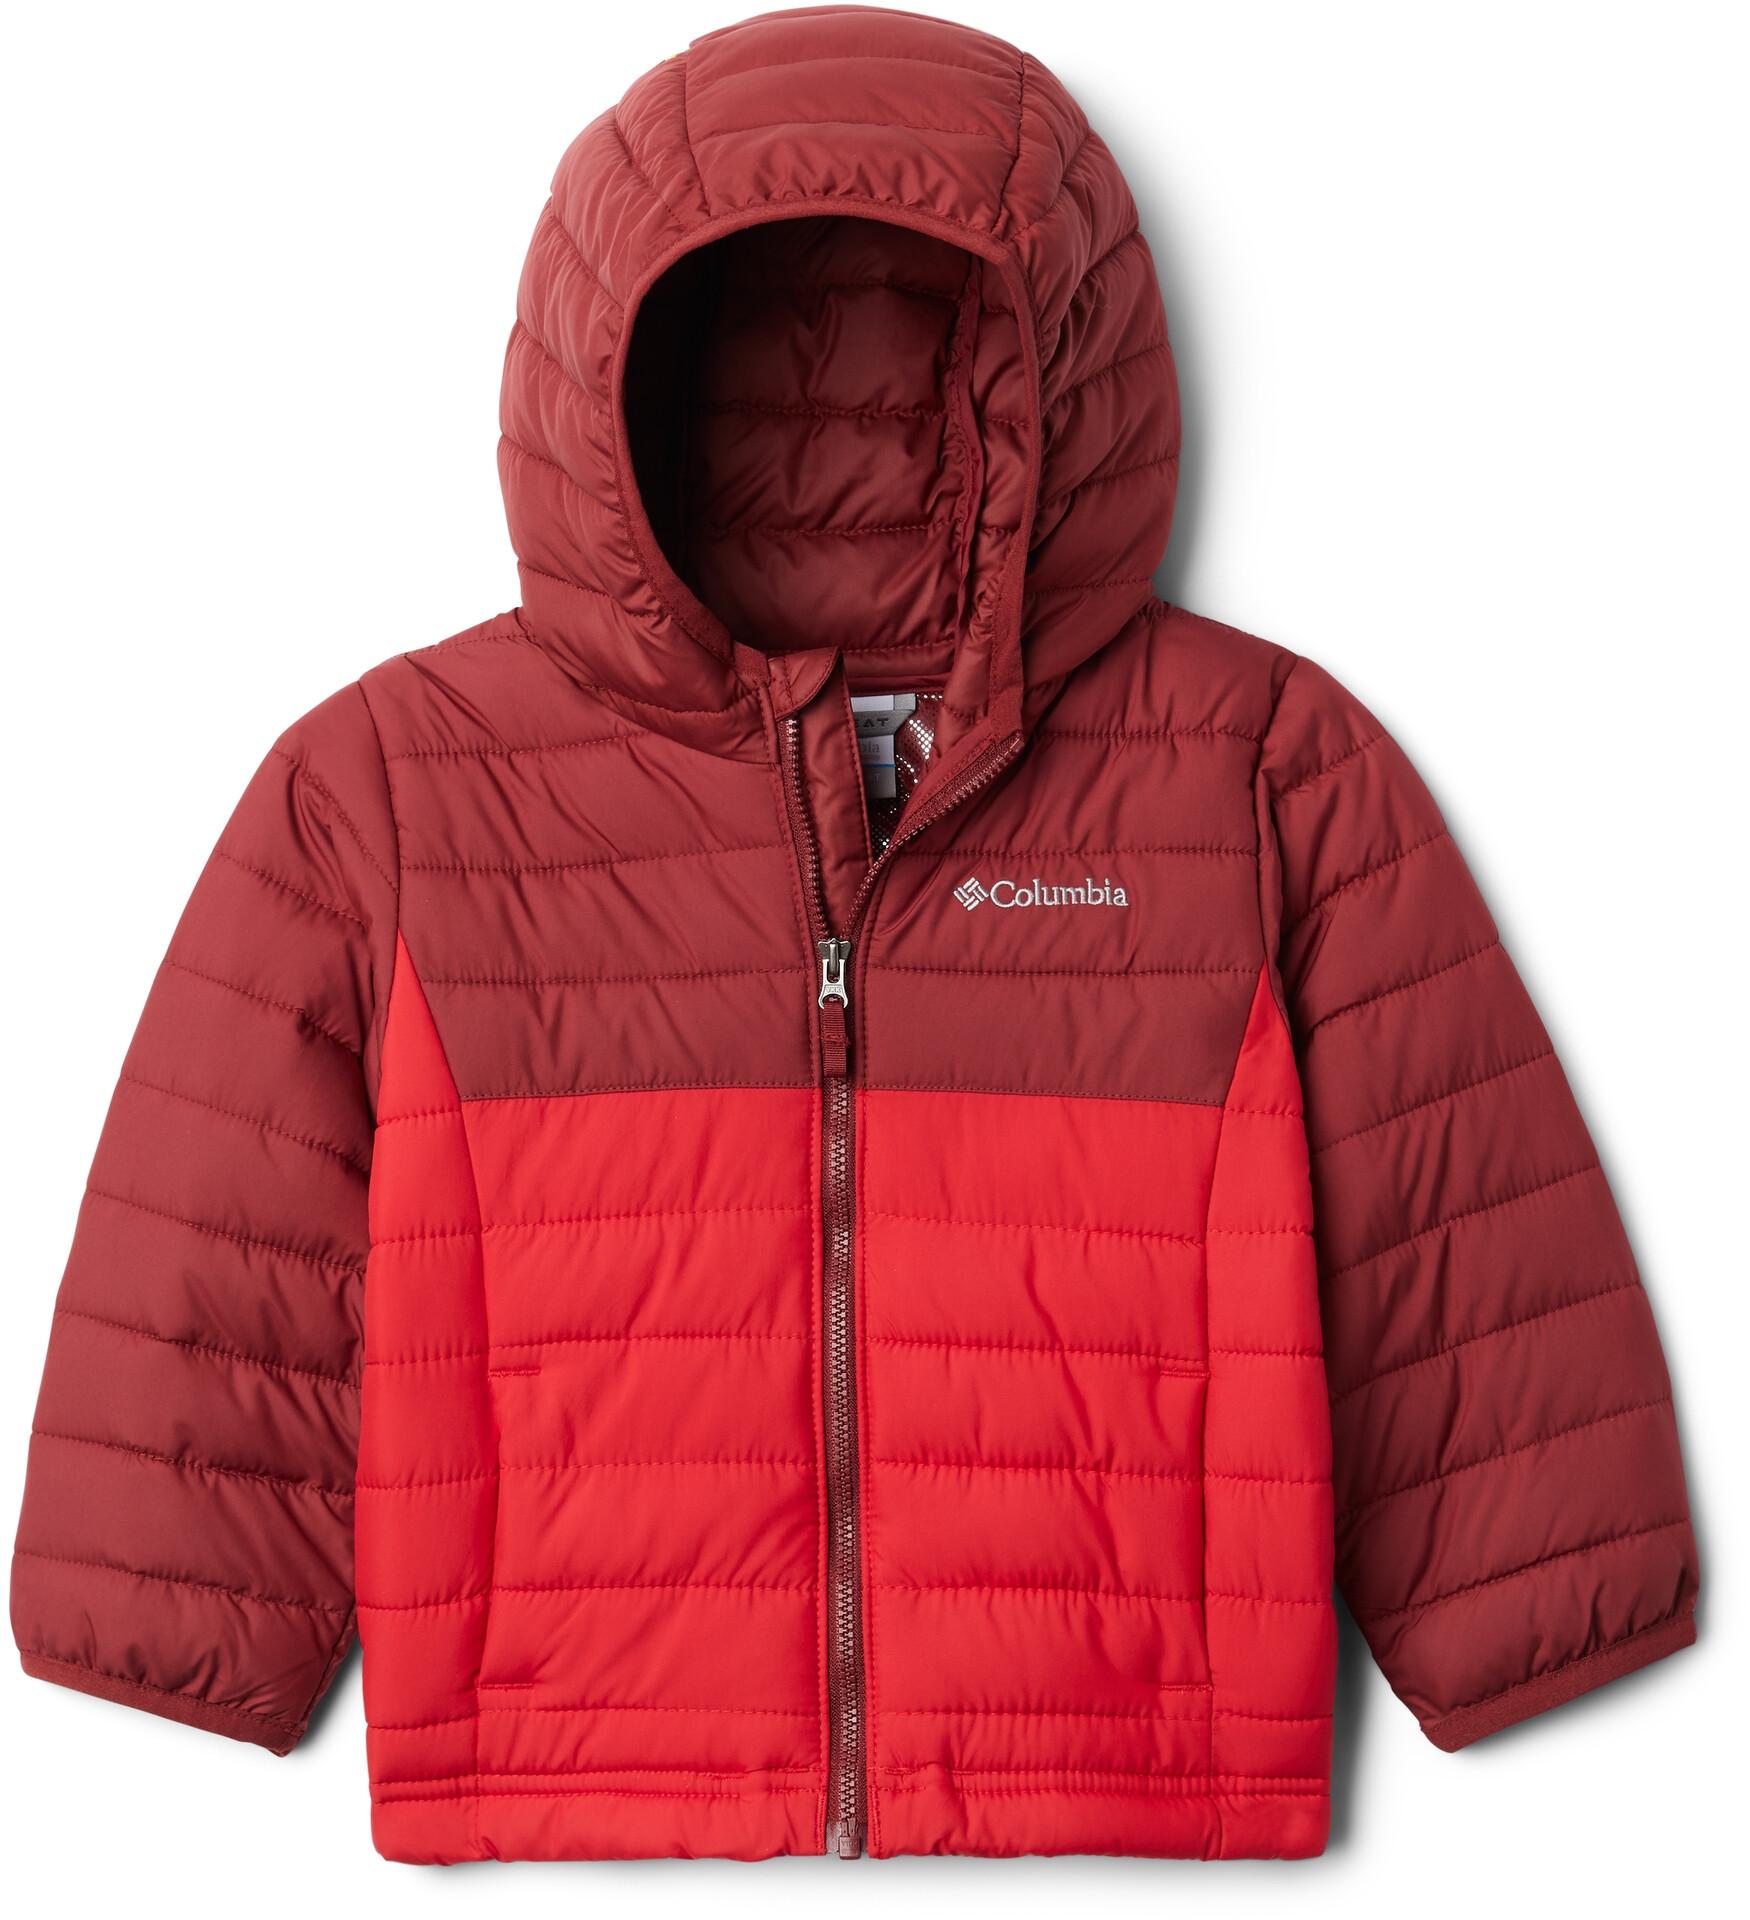 Columbia Powder Lite Kapuzenjacke Jungen mountain redred jasper